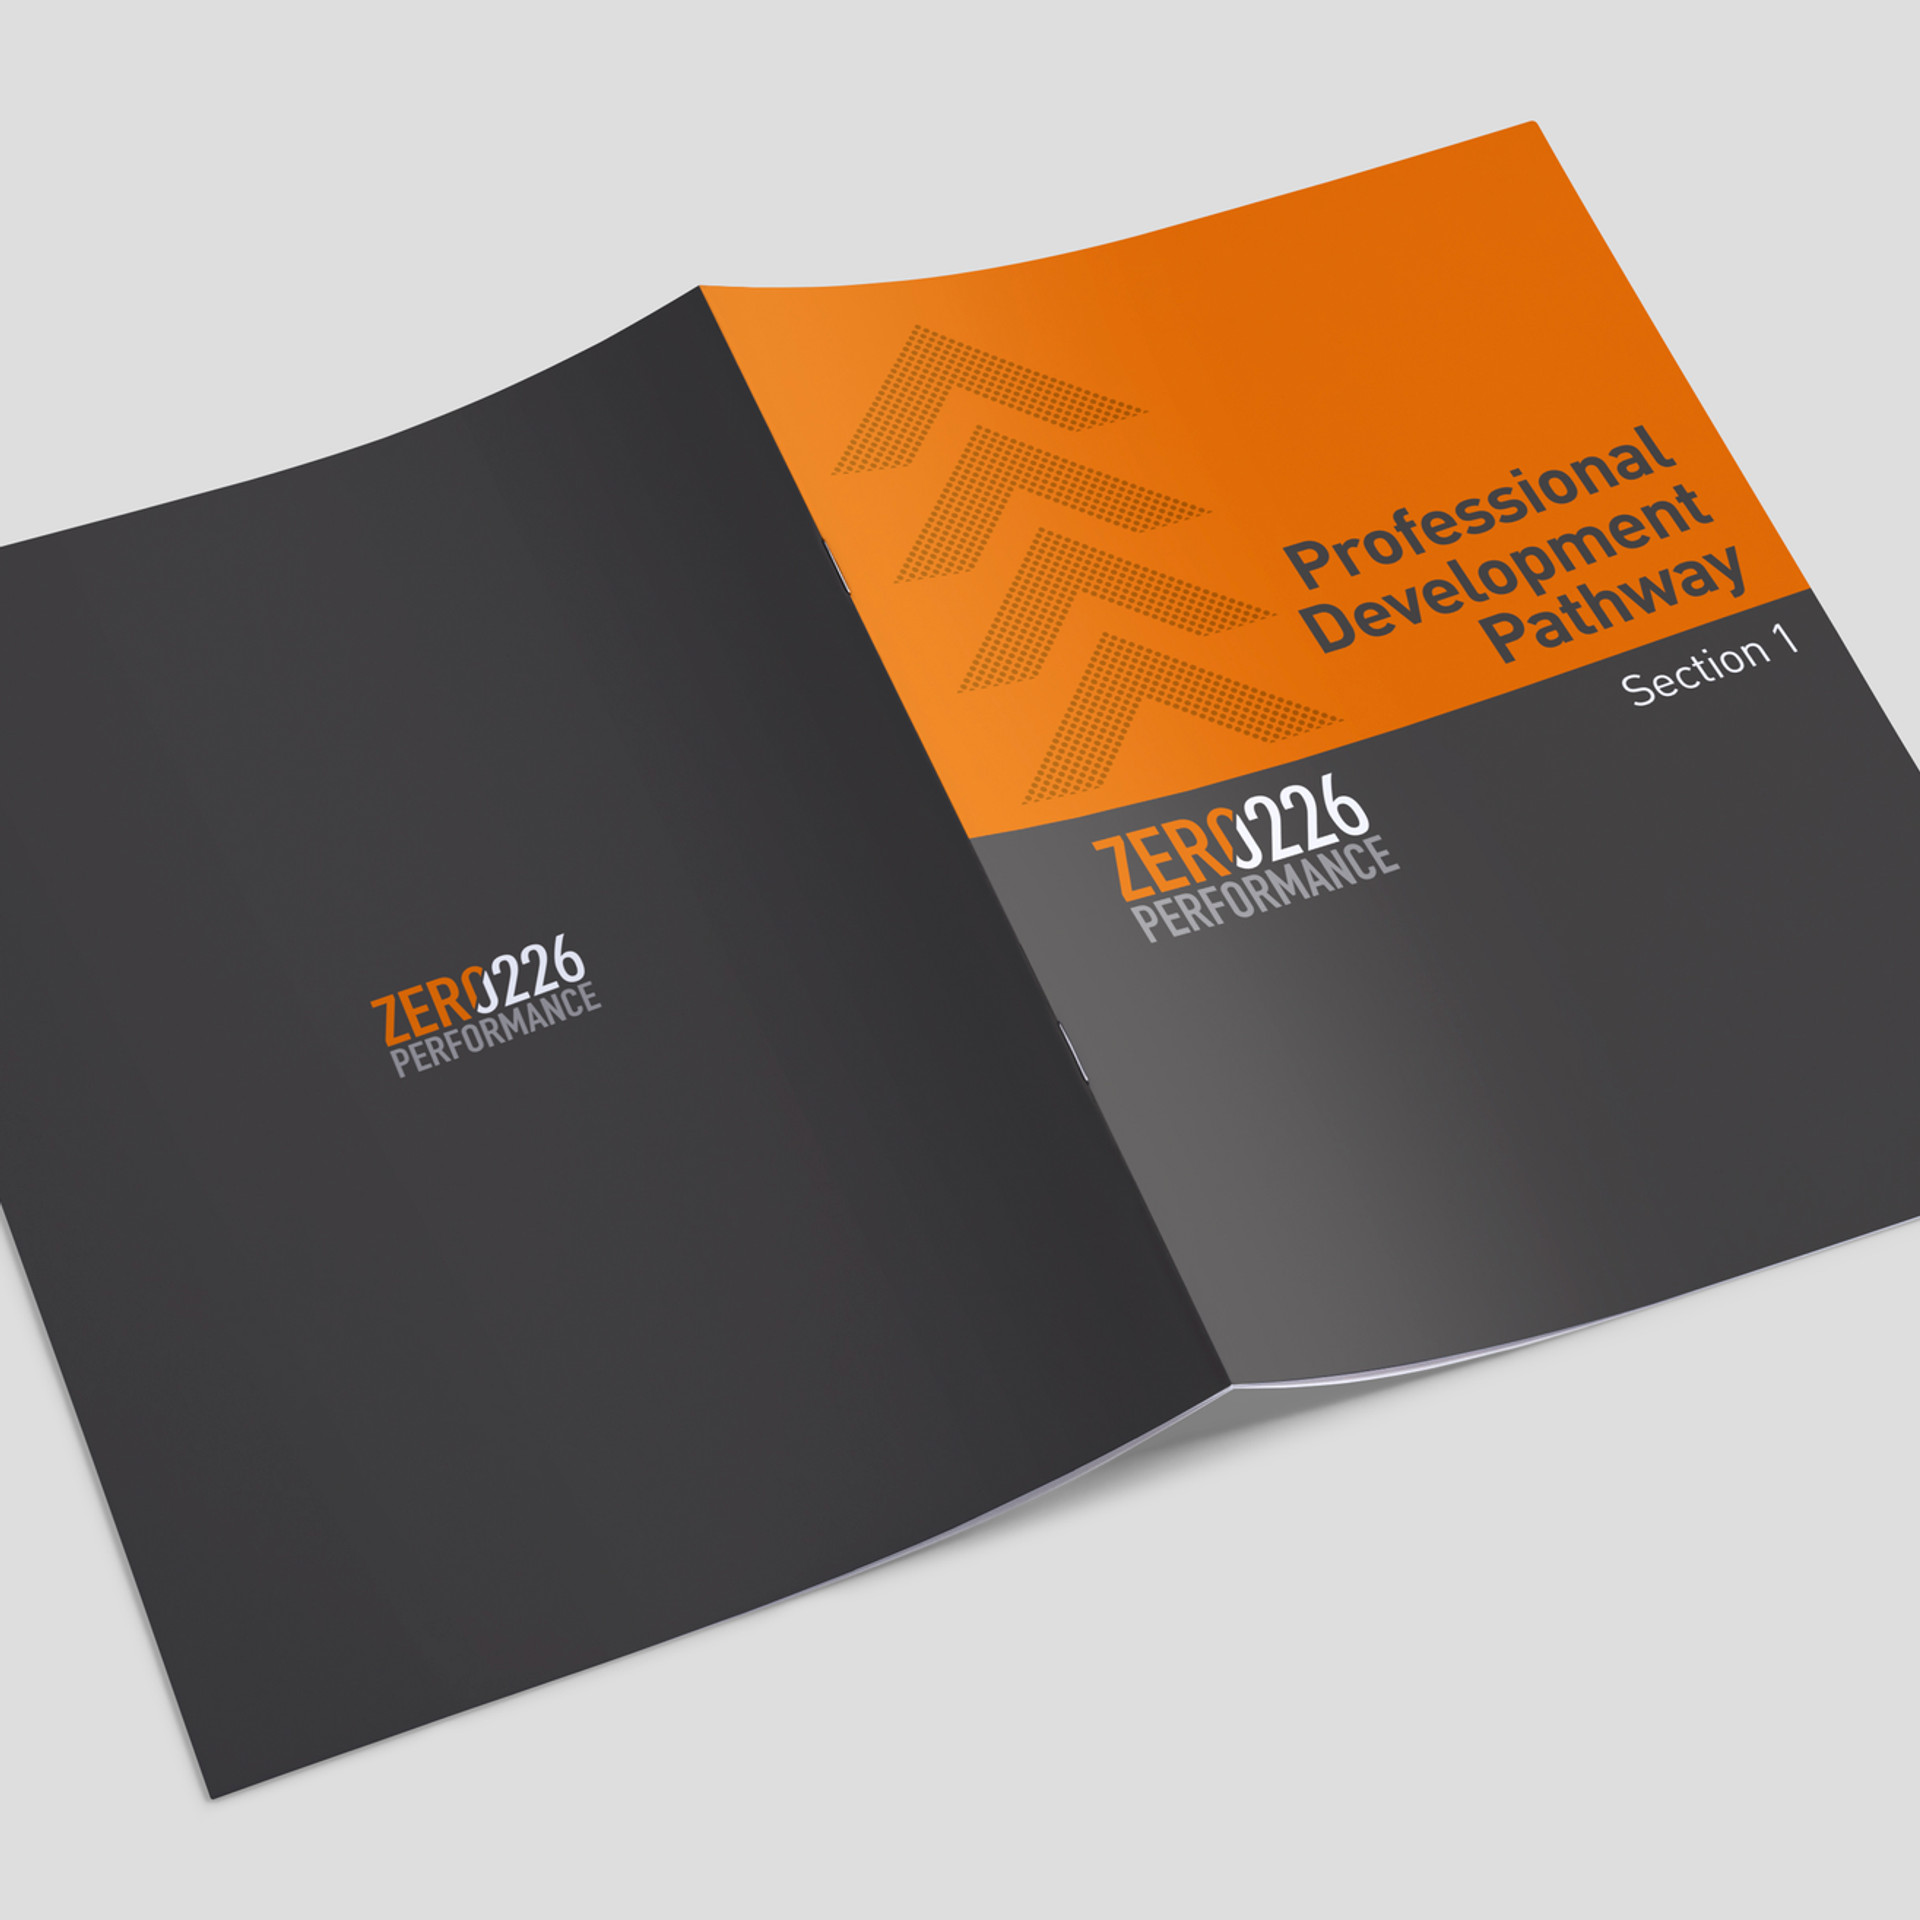 Zer0226 Performance Identity Design